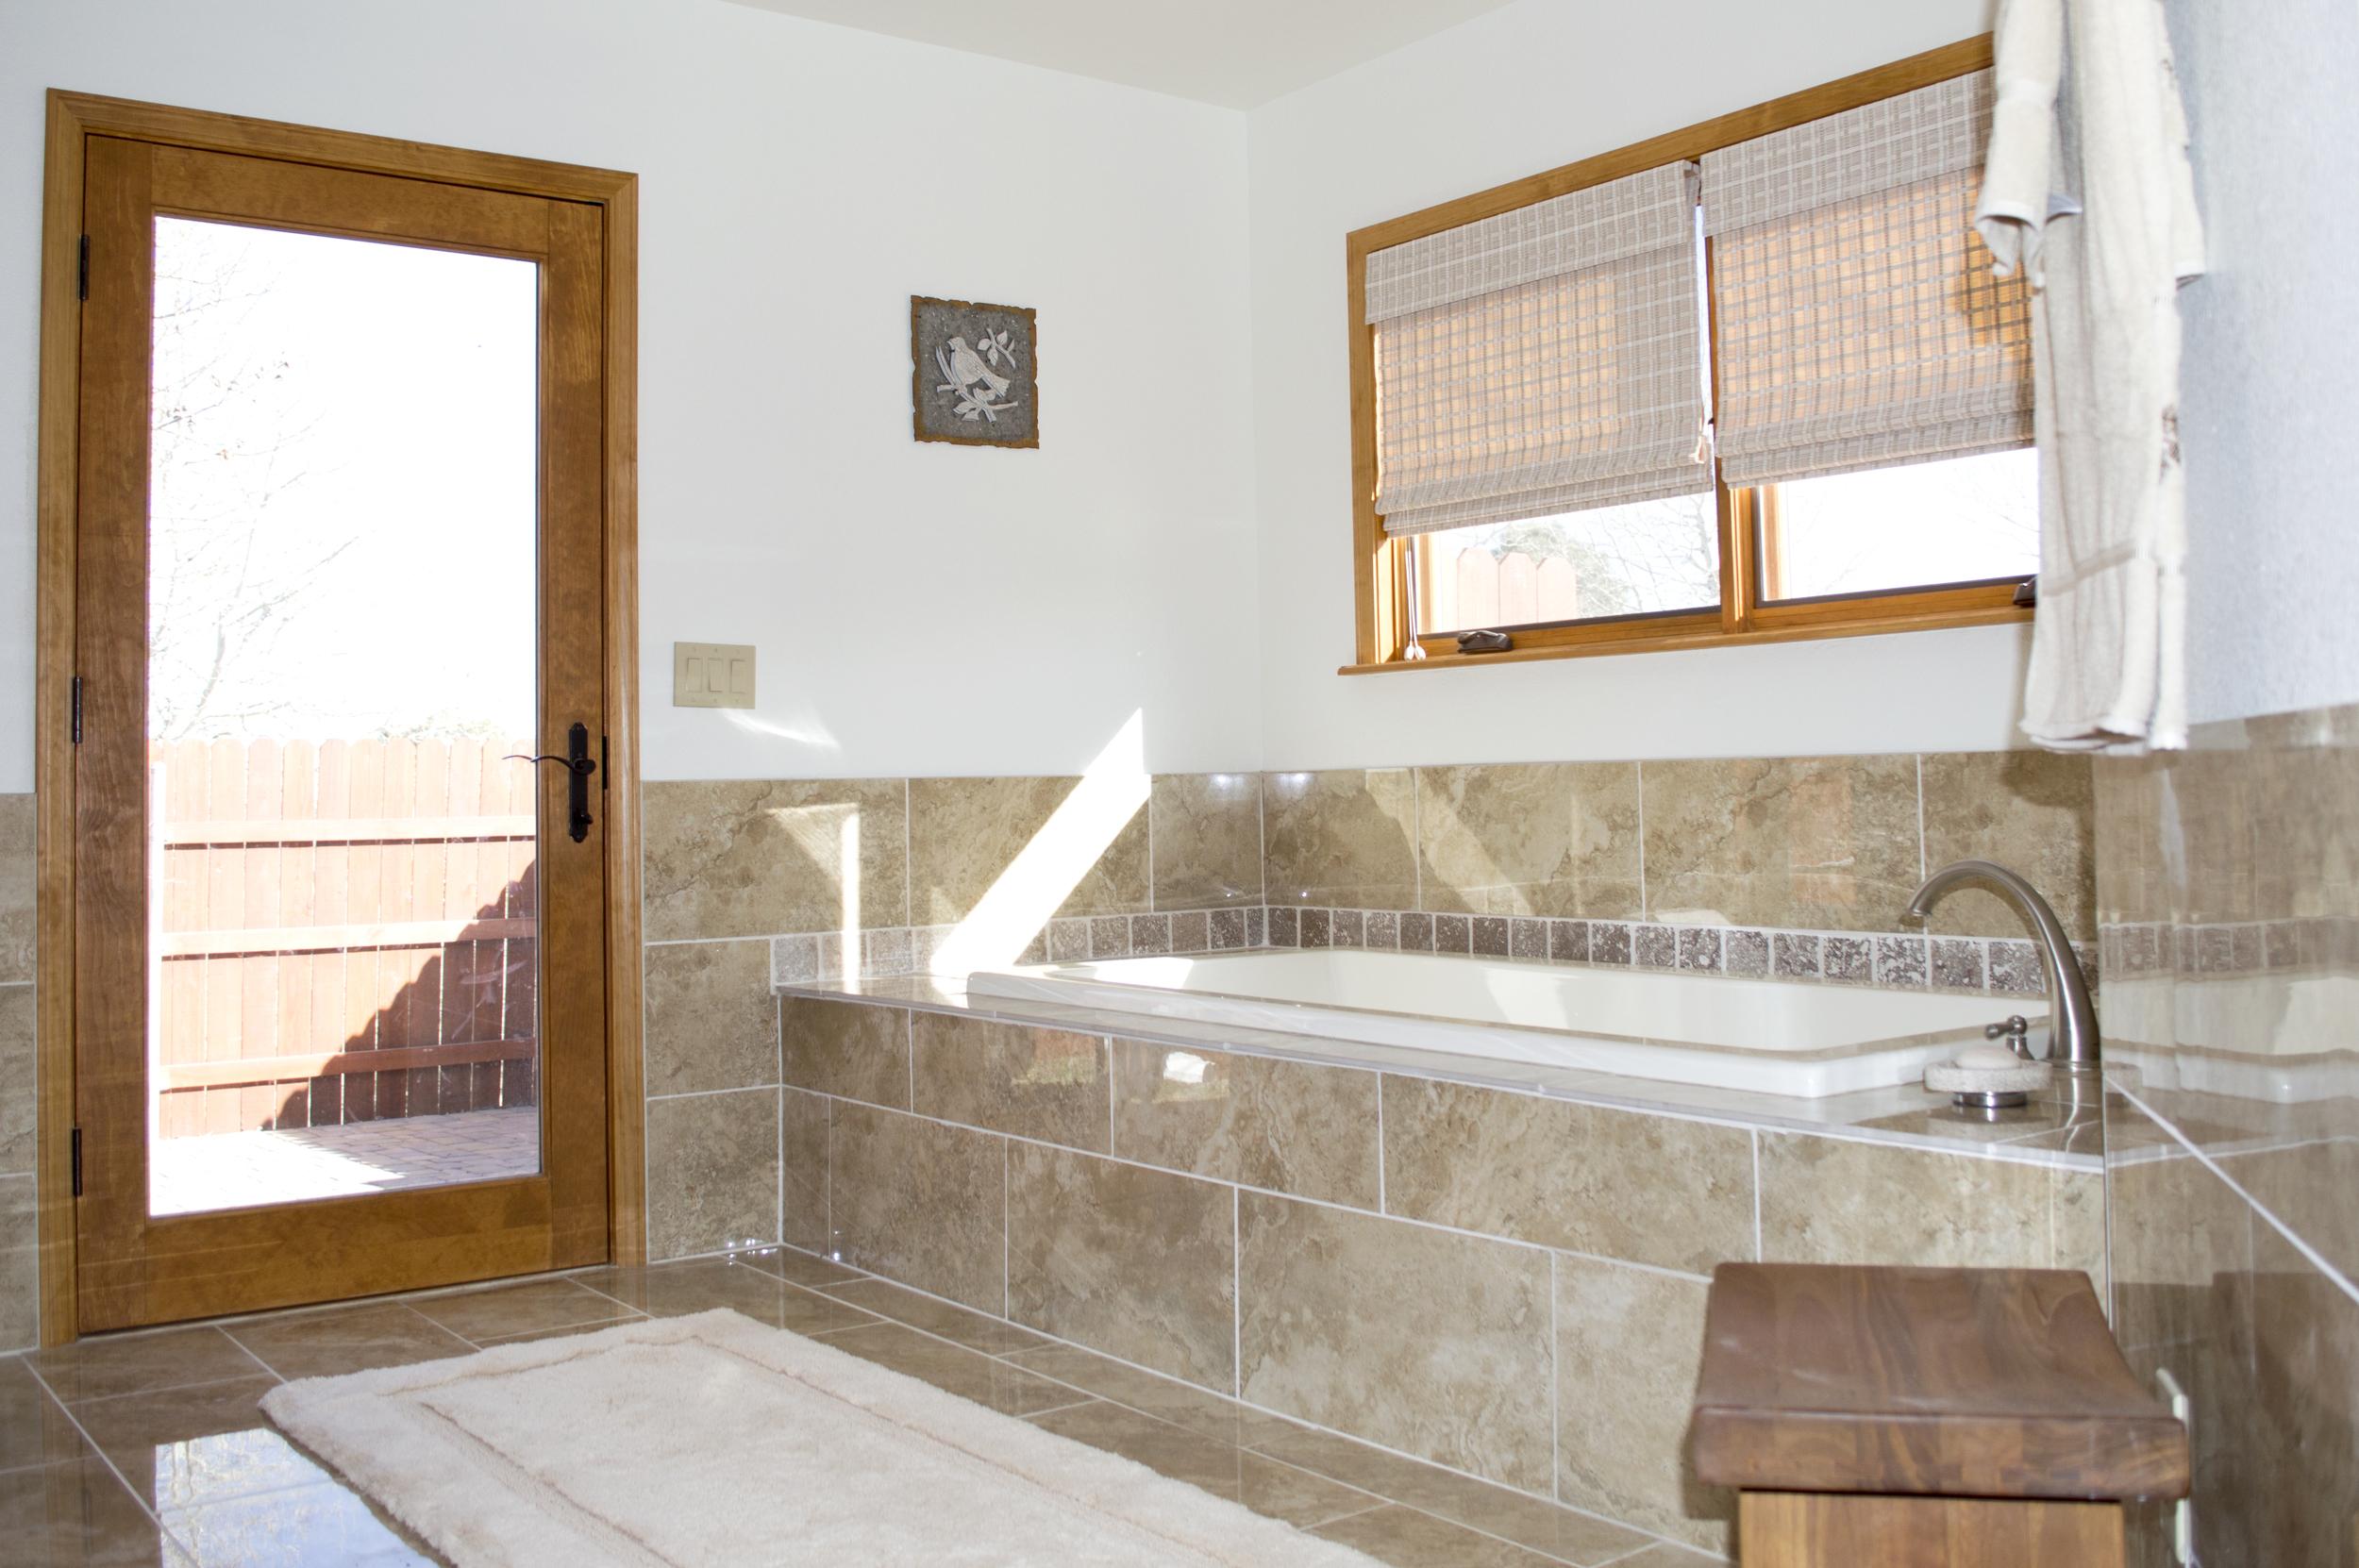 Bathroom remodel of a residential home near Flagstaff, Arizona.